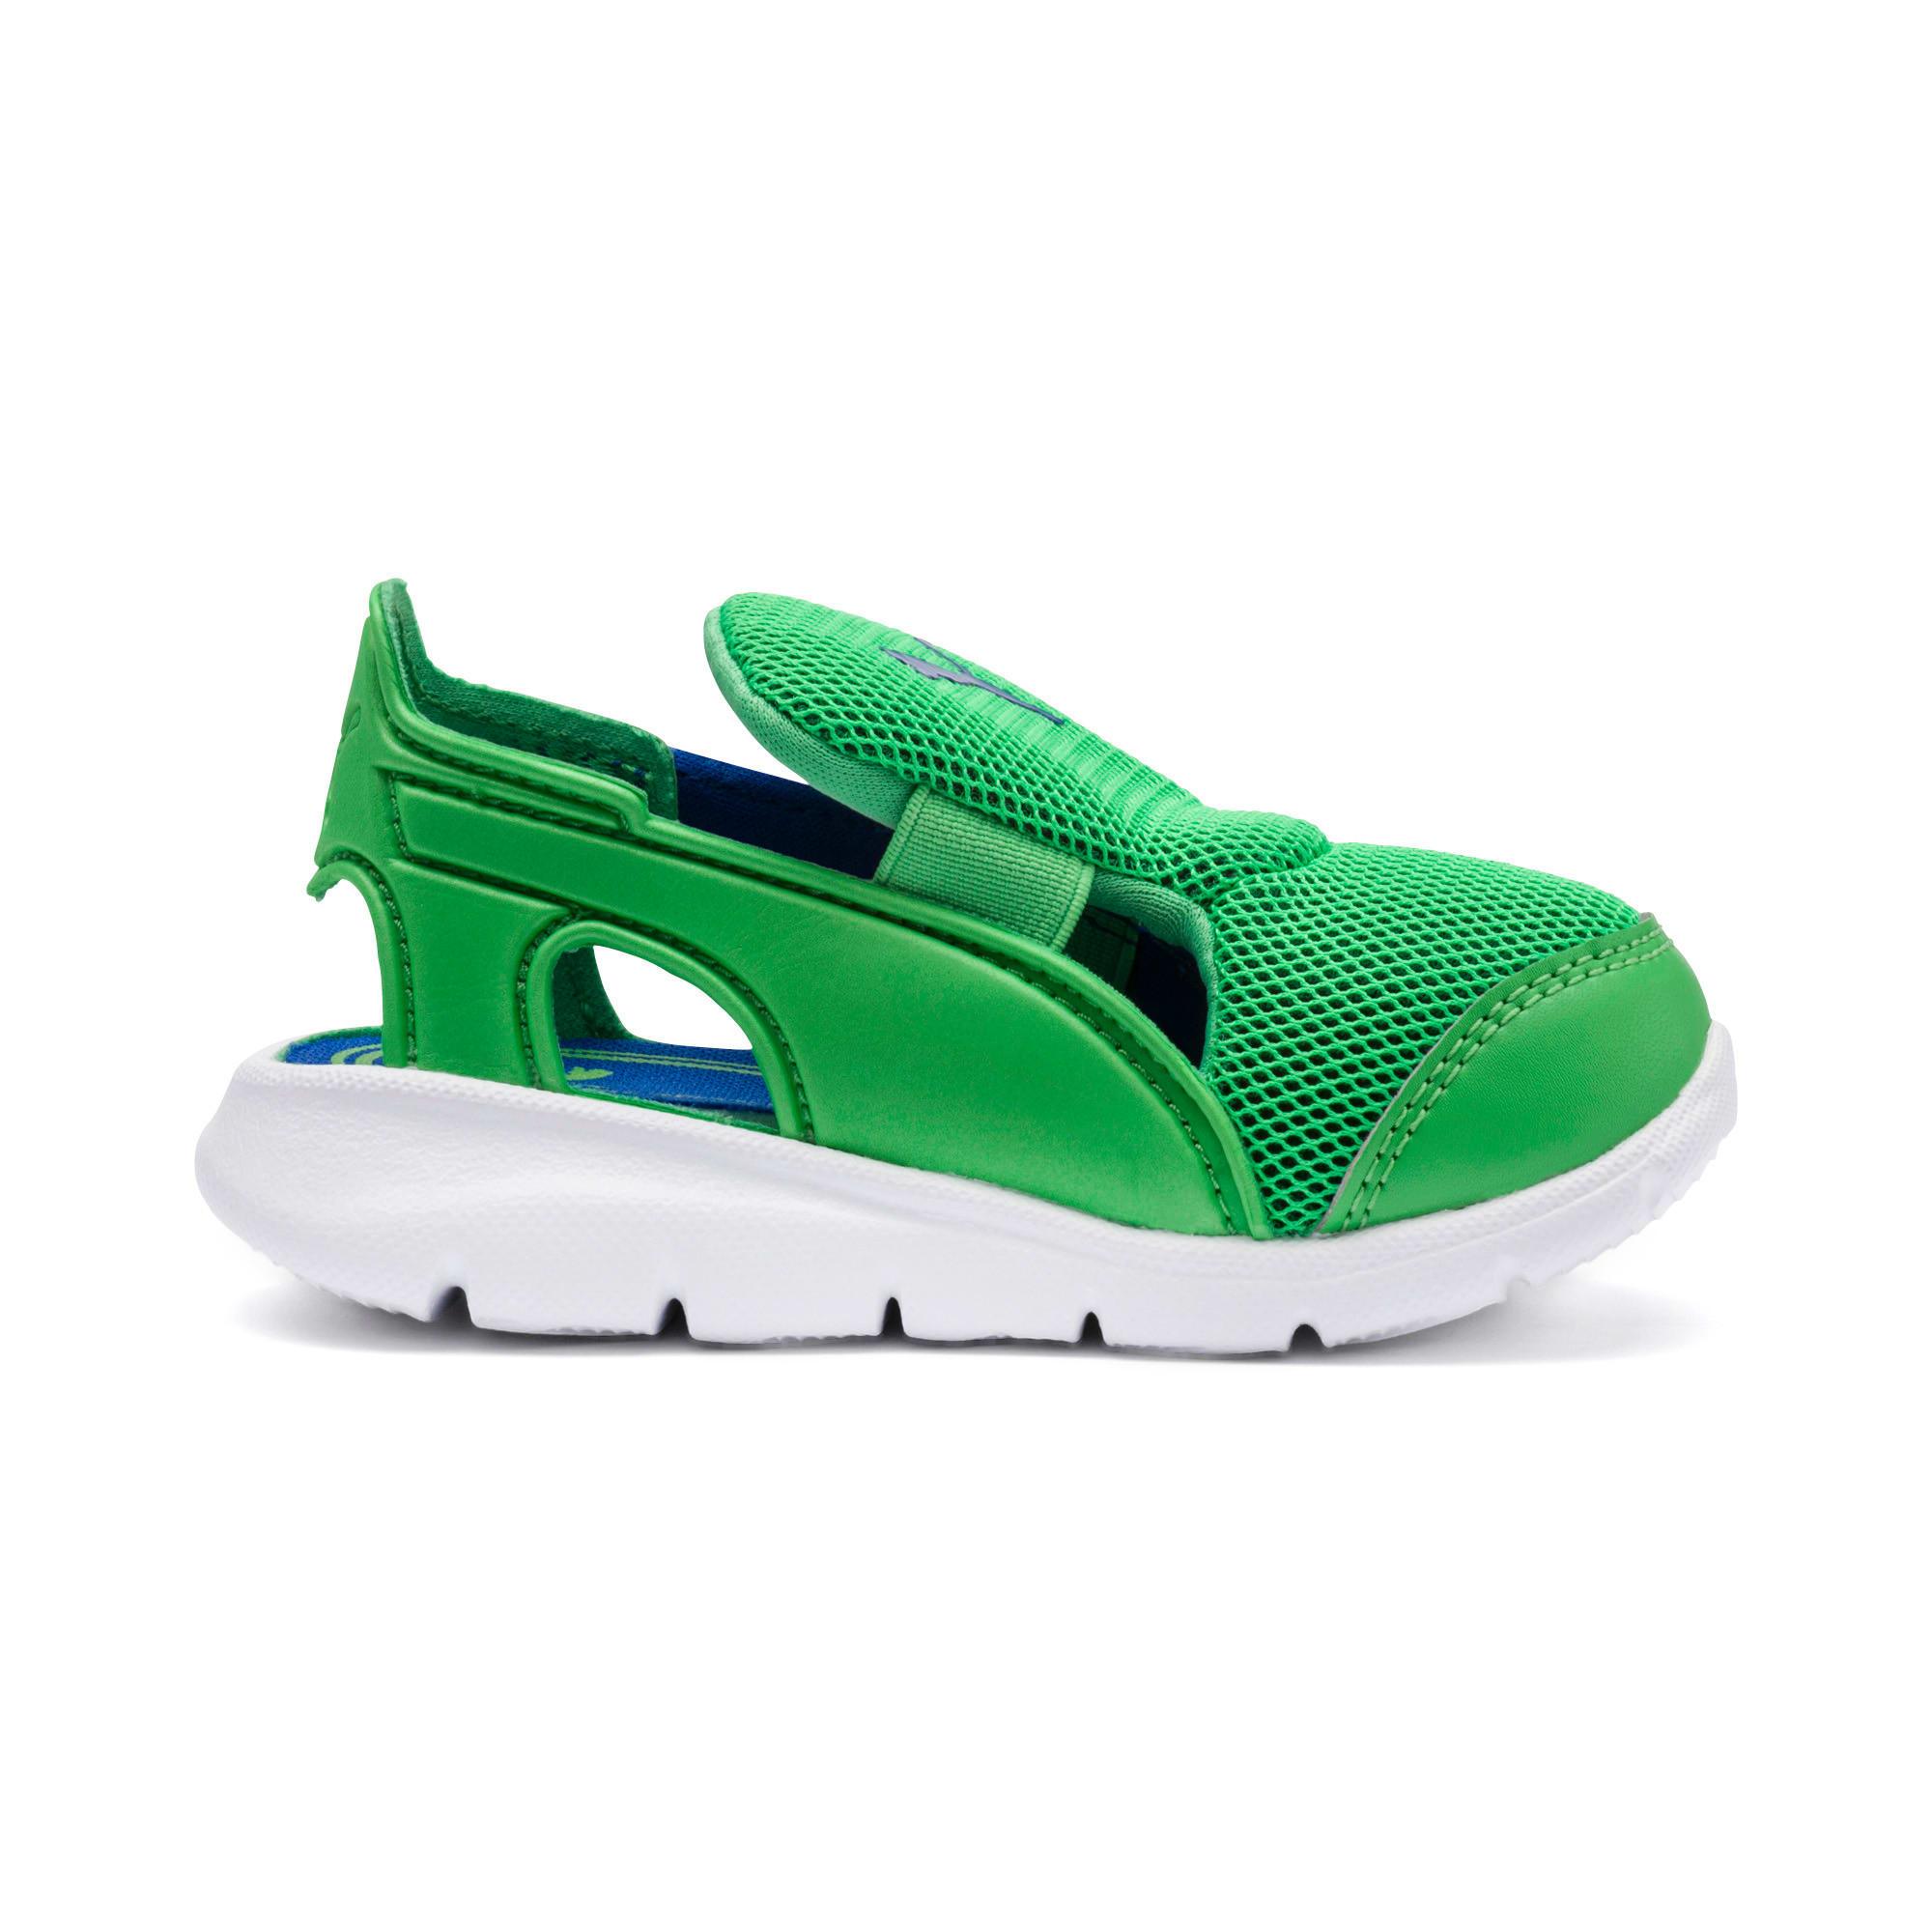 Thumbnail 5 of PUMA Bao 3 Open Toddler Shoes, Surf The Web-Irish Green, medium